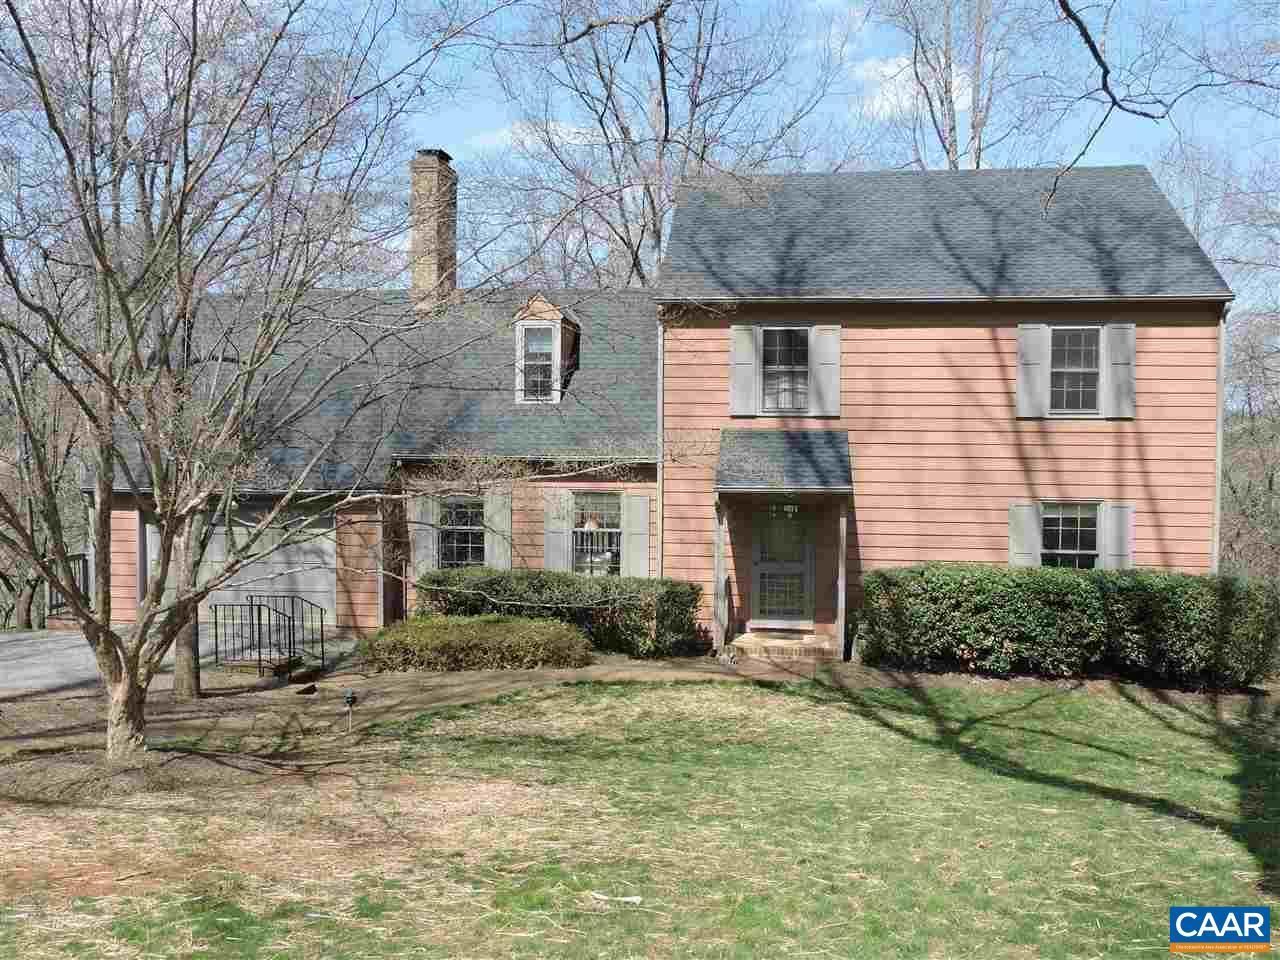 home for sale , MLS #573608, 2580 Kimbrough Cir